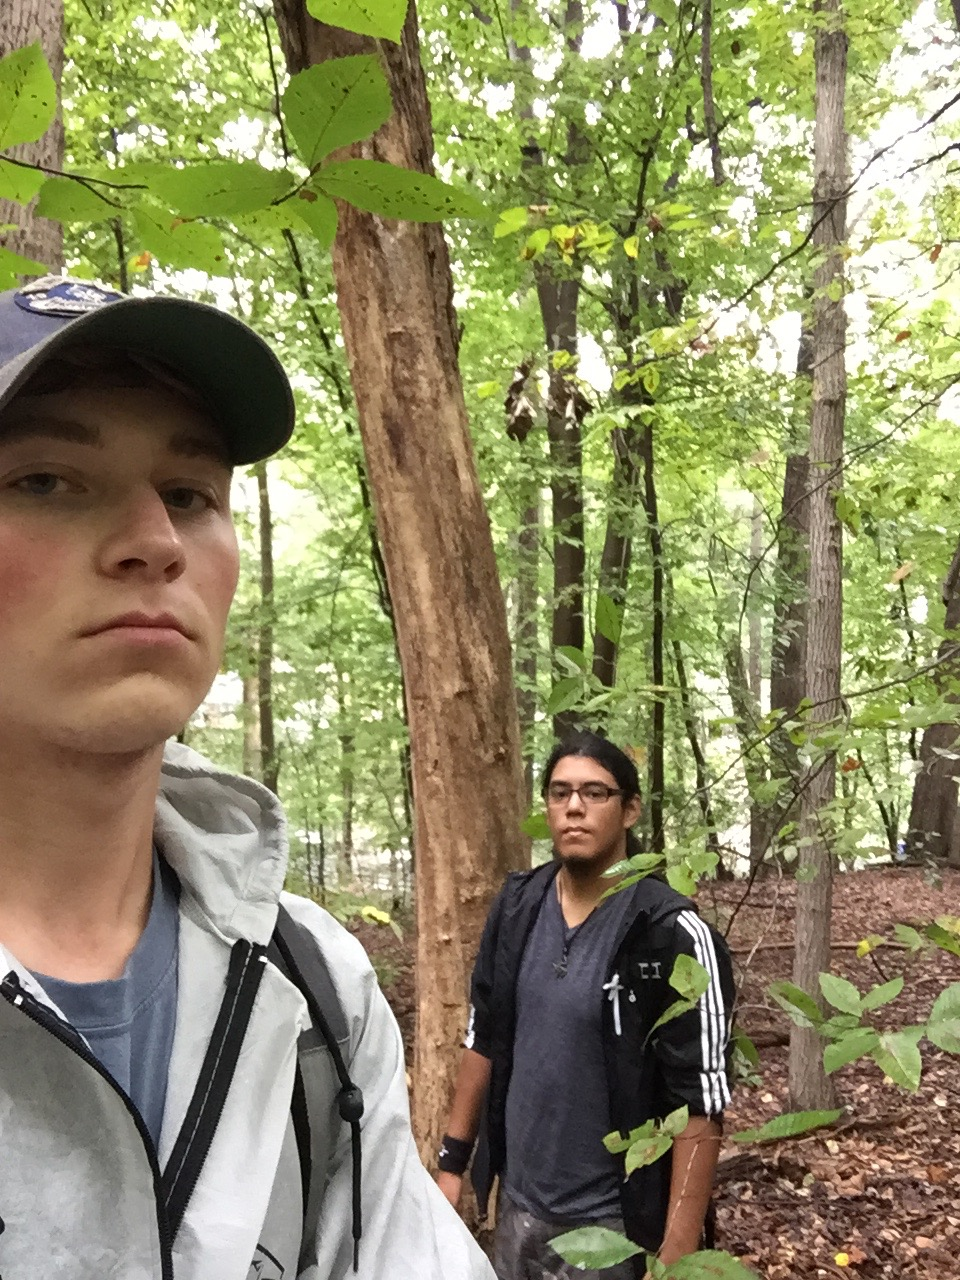 Selfie with a Classmate